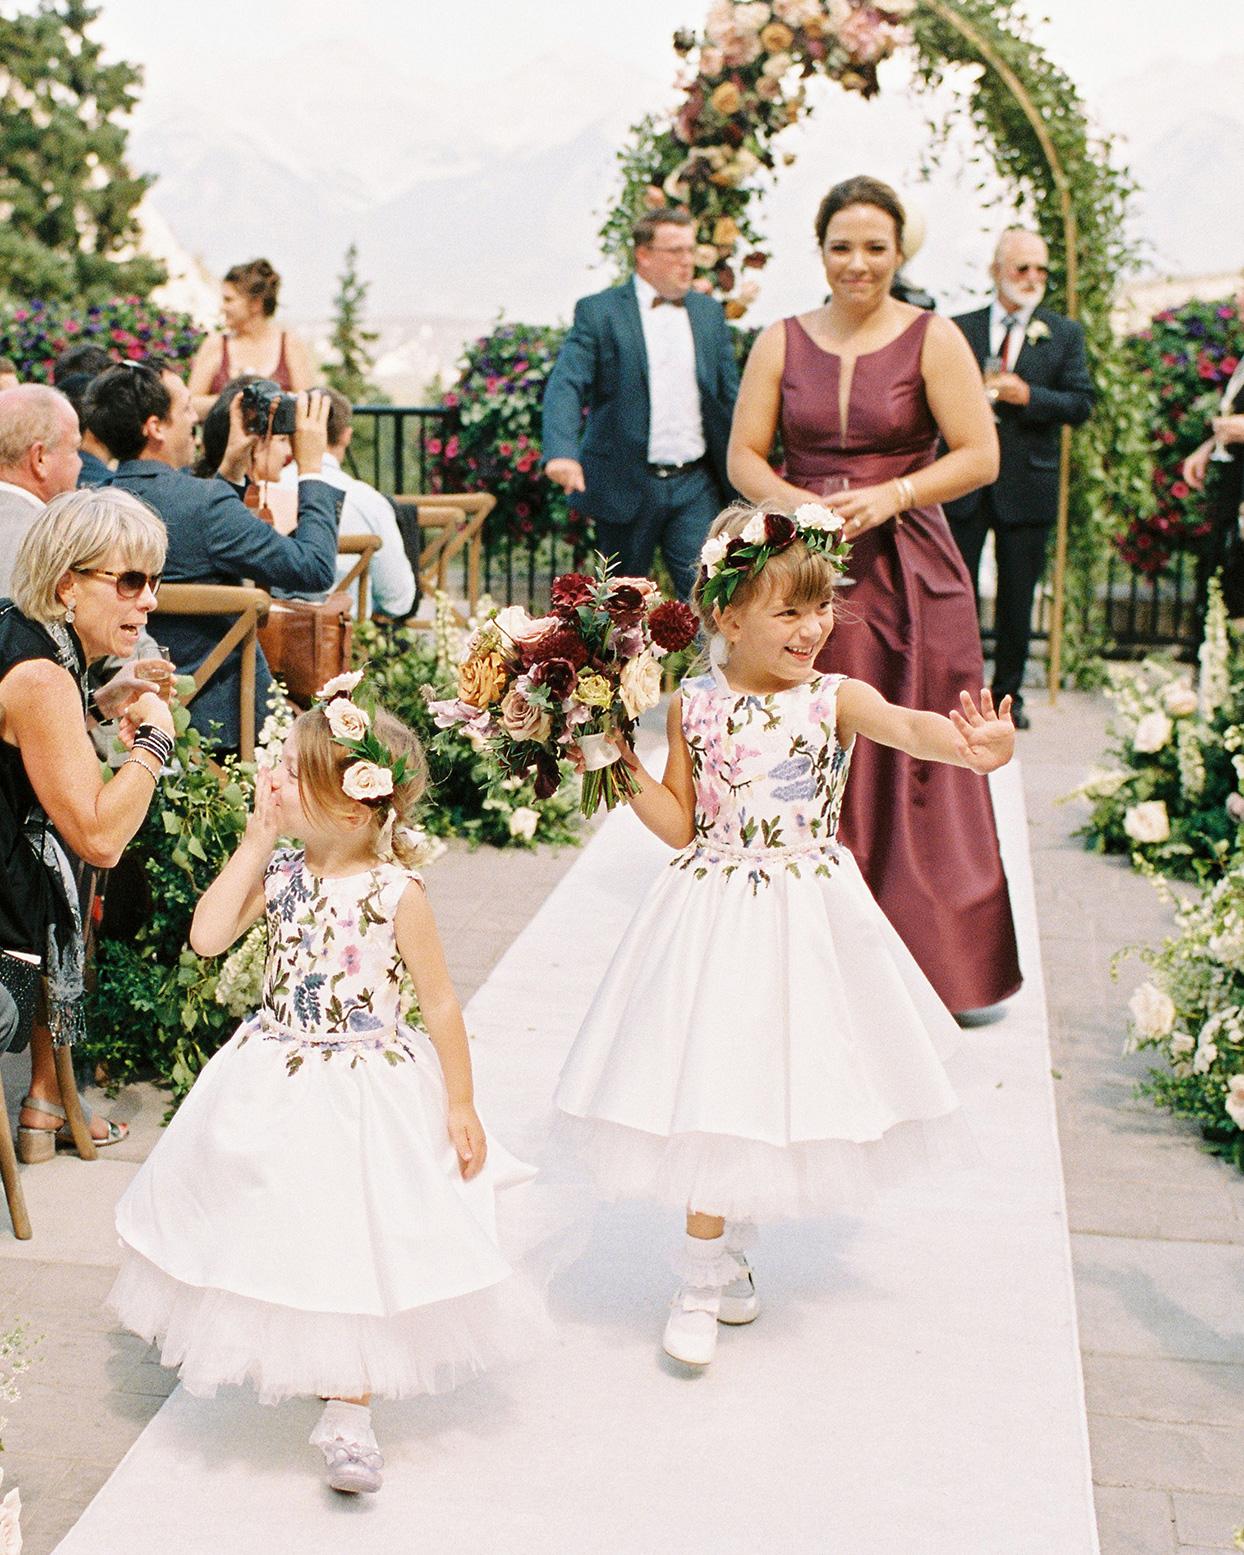 katie nicholas wedding flower girls in white and floral